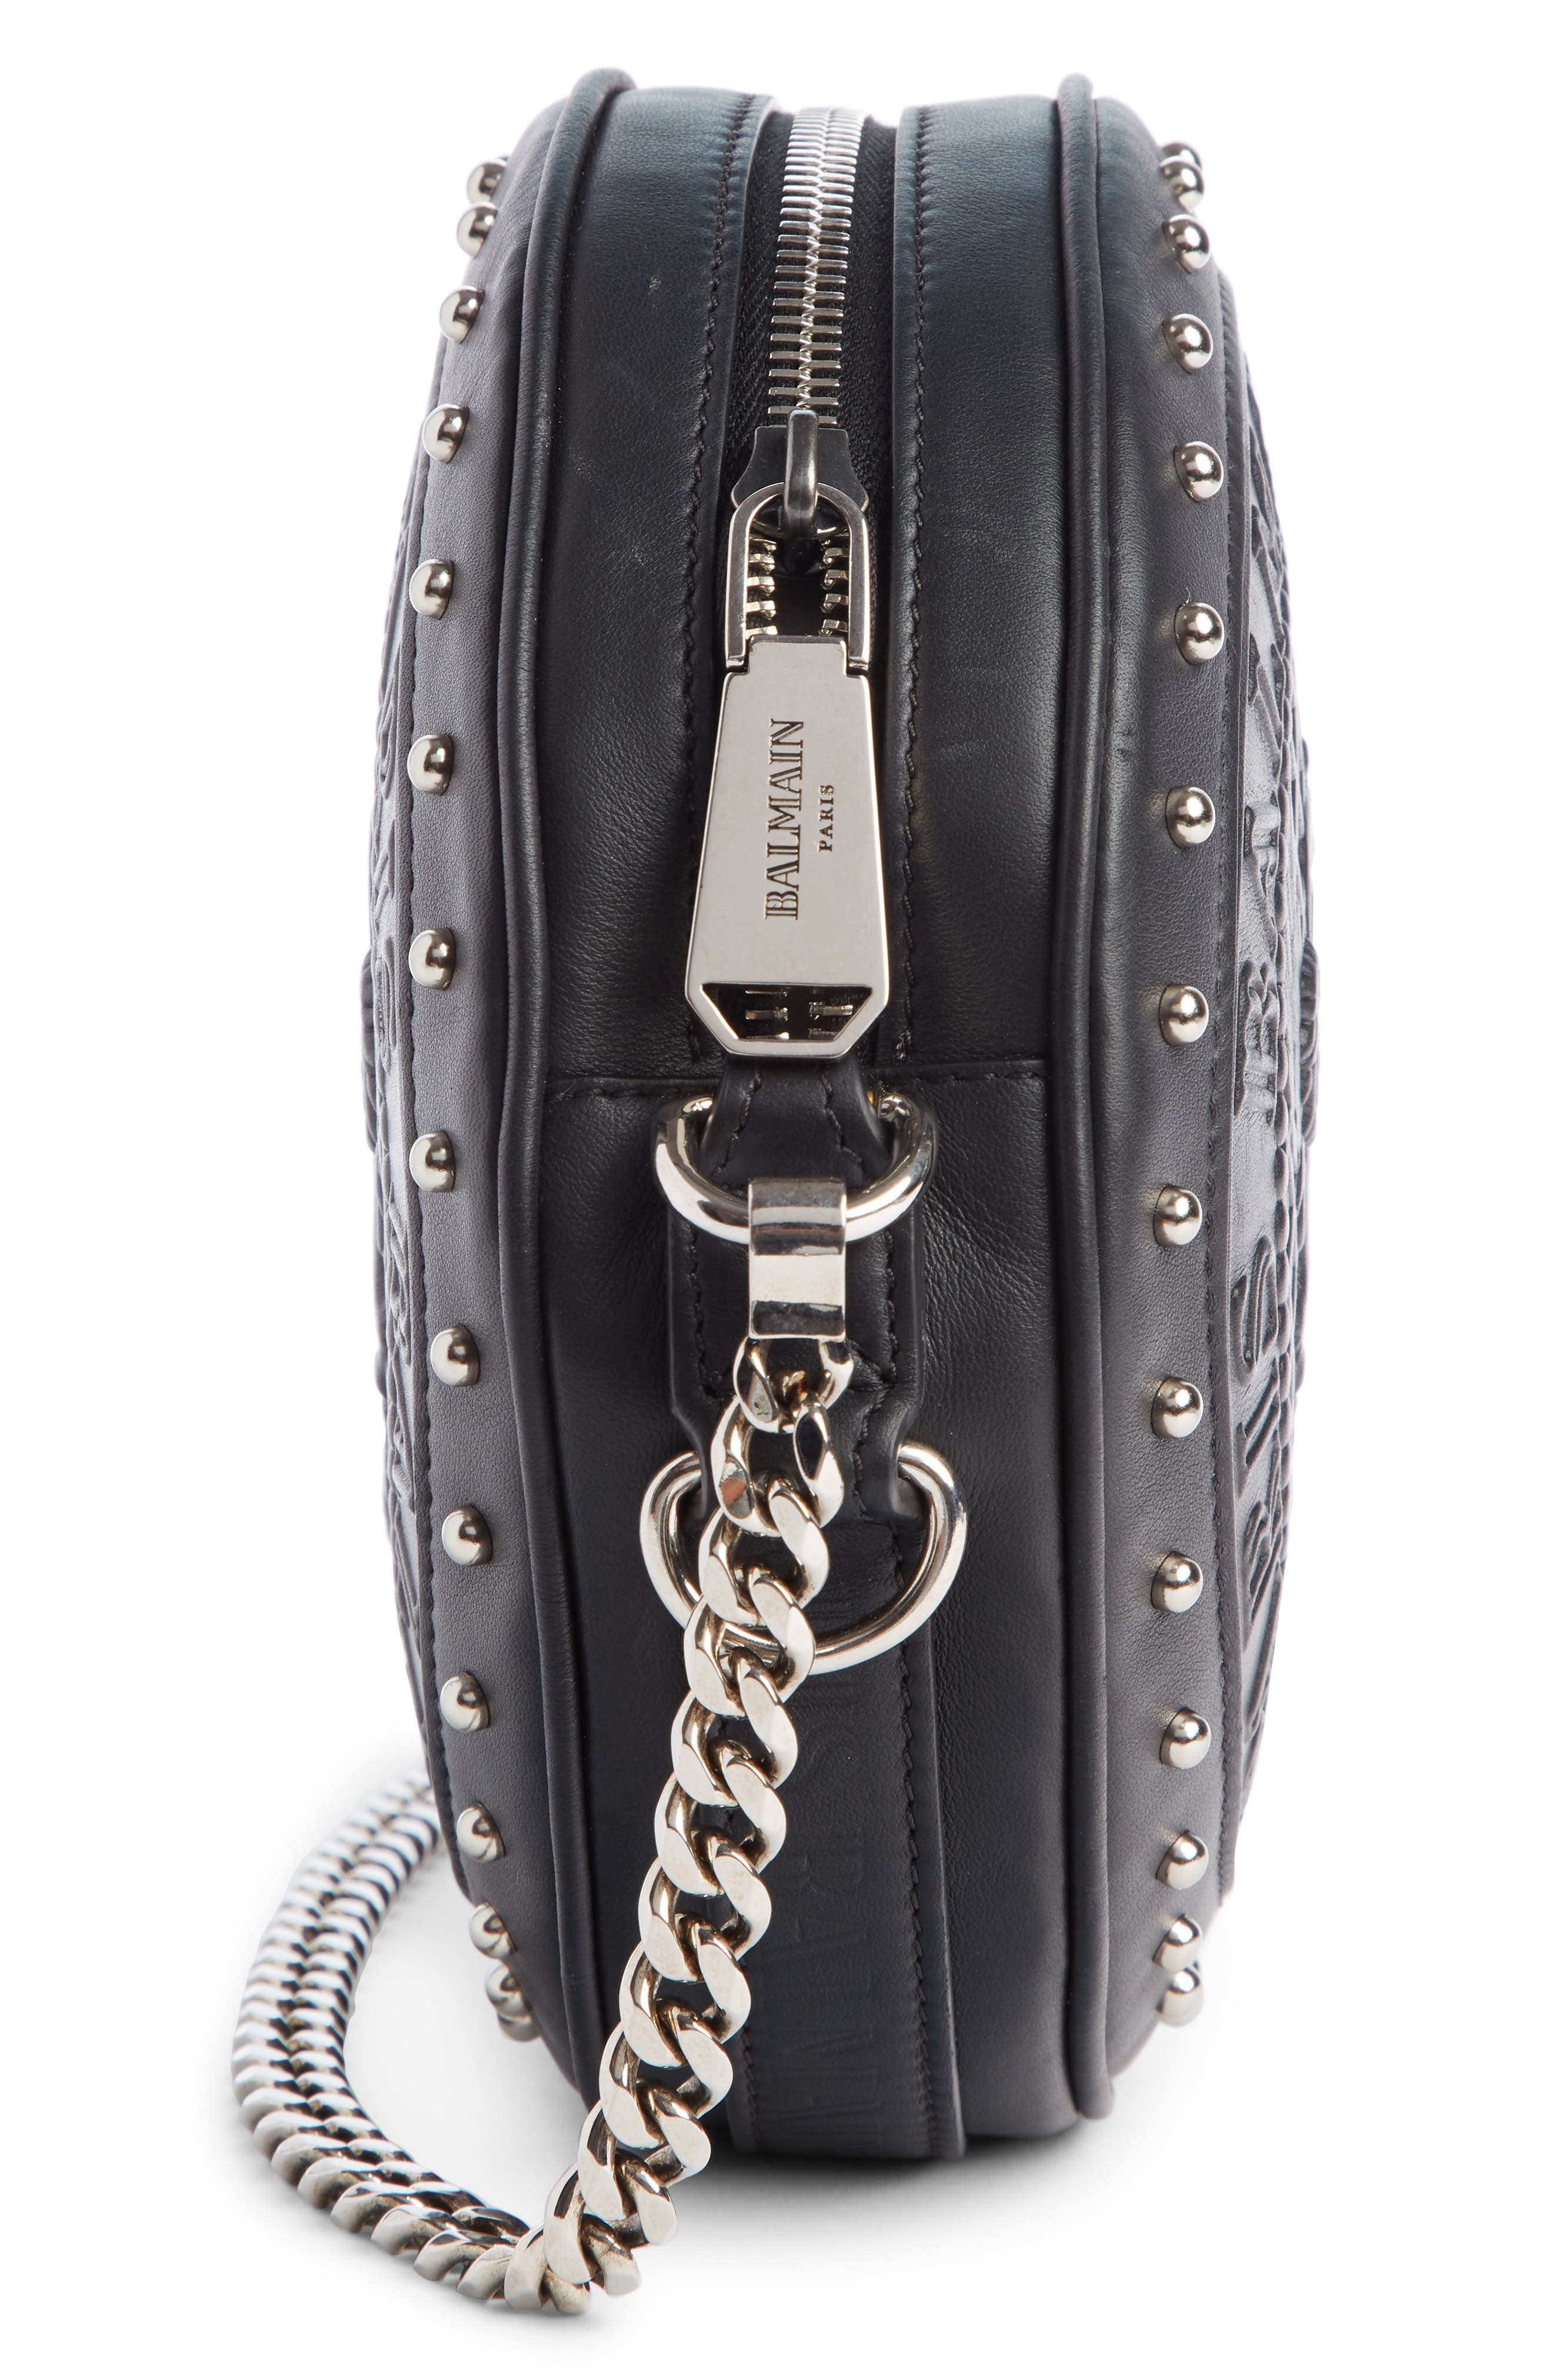 BALMAIN, Disco Embossed Calfskin Leather Crossbody Bag, Alternate thumbnail 4, color, NOIR